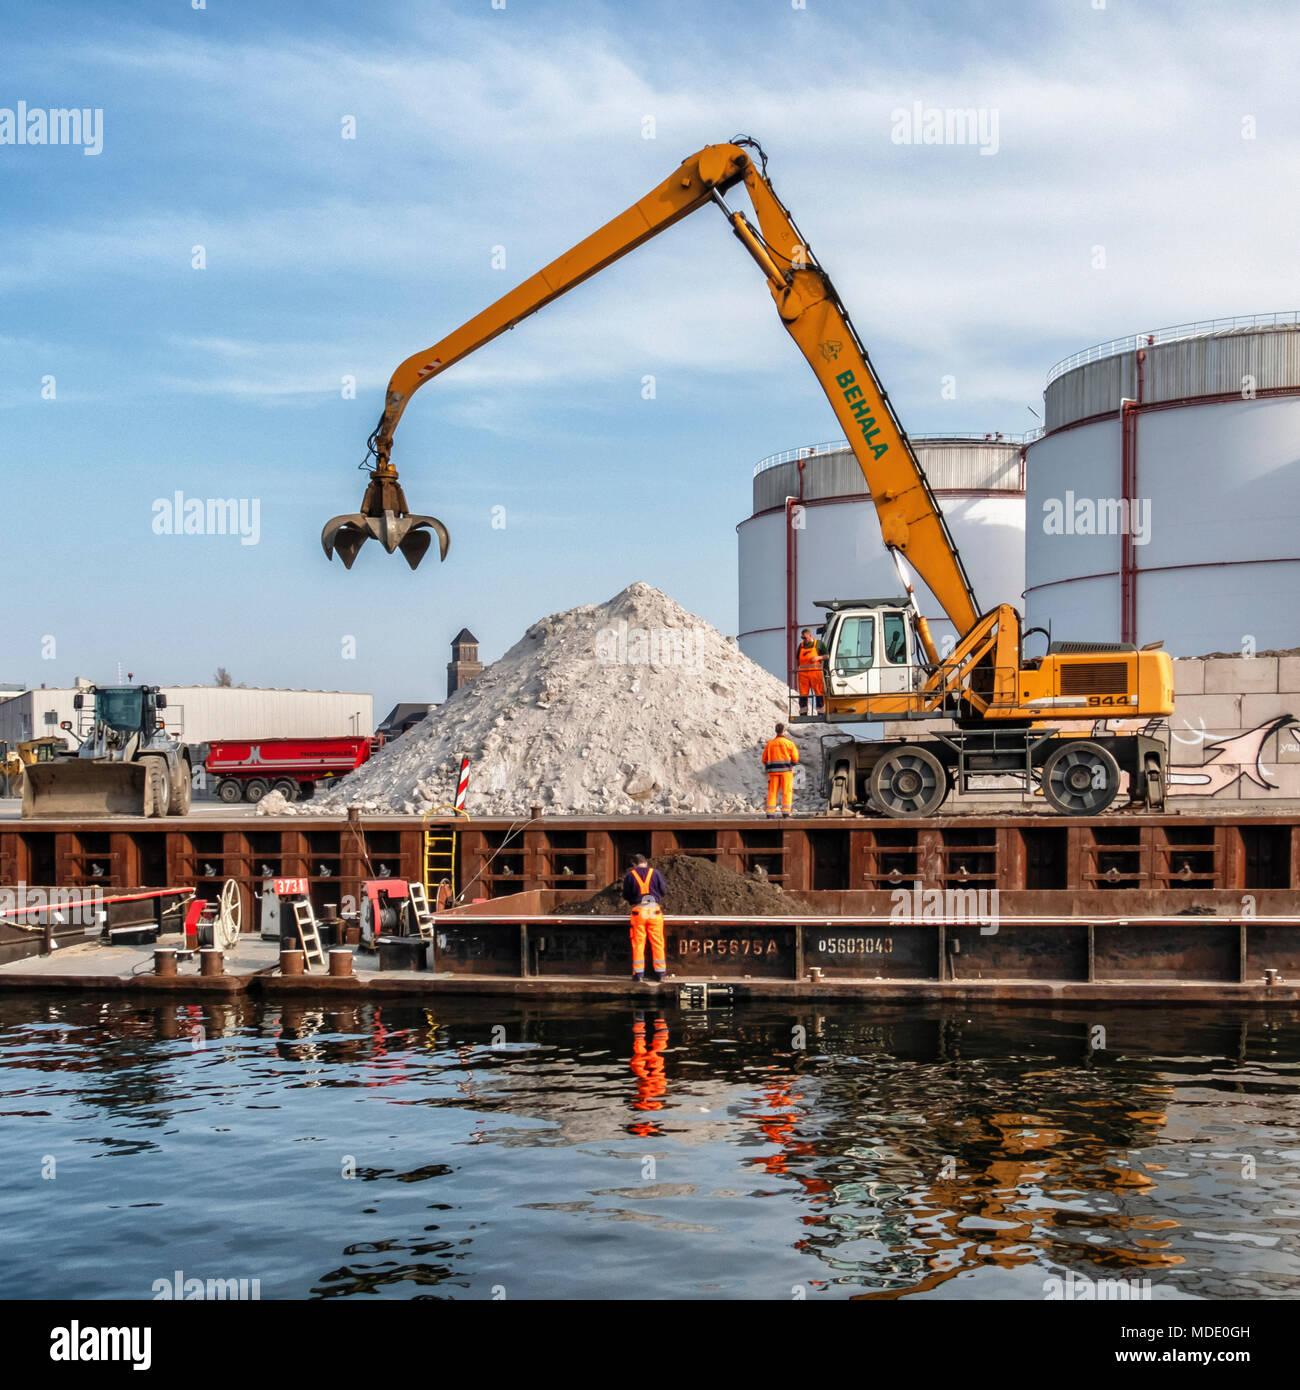 Berlin-Moabit,Westhafen,West Harbour,. SCHWENK German cement manufacturer supplies of cement, concrete, sand & gravel..Cranes & silos Stock Photo